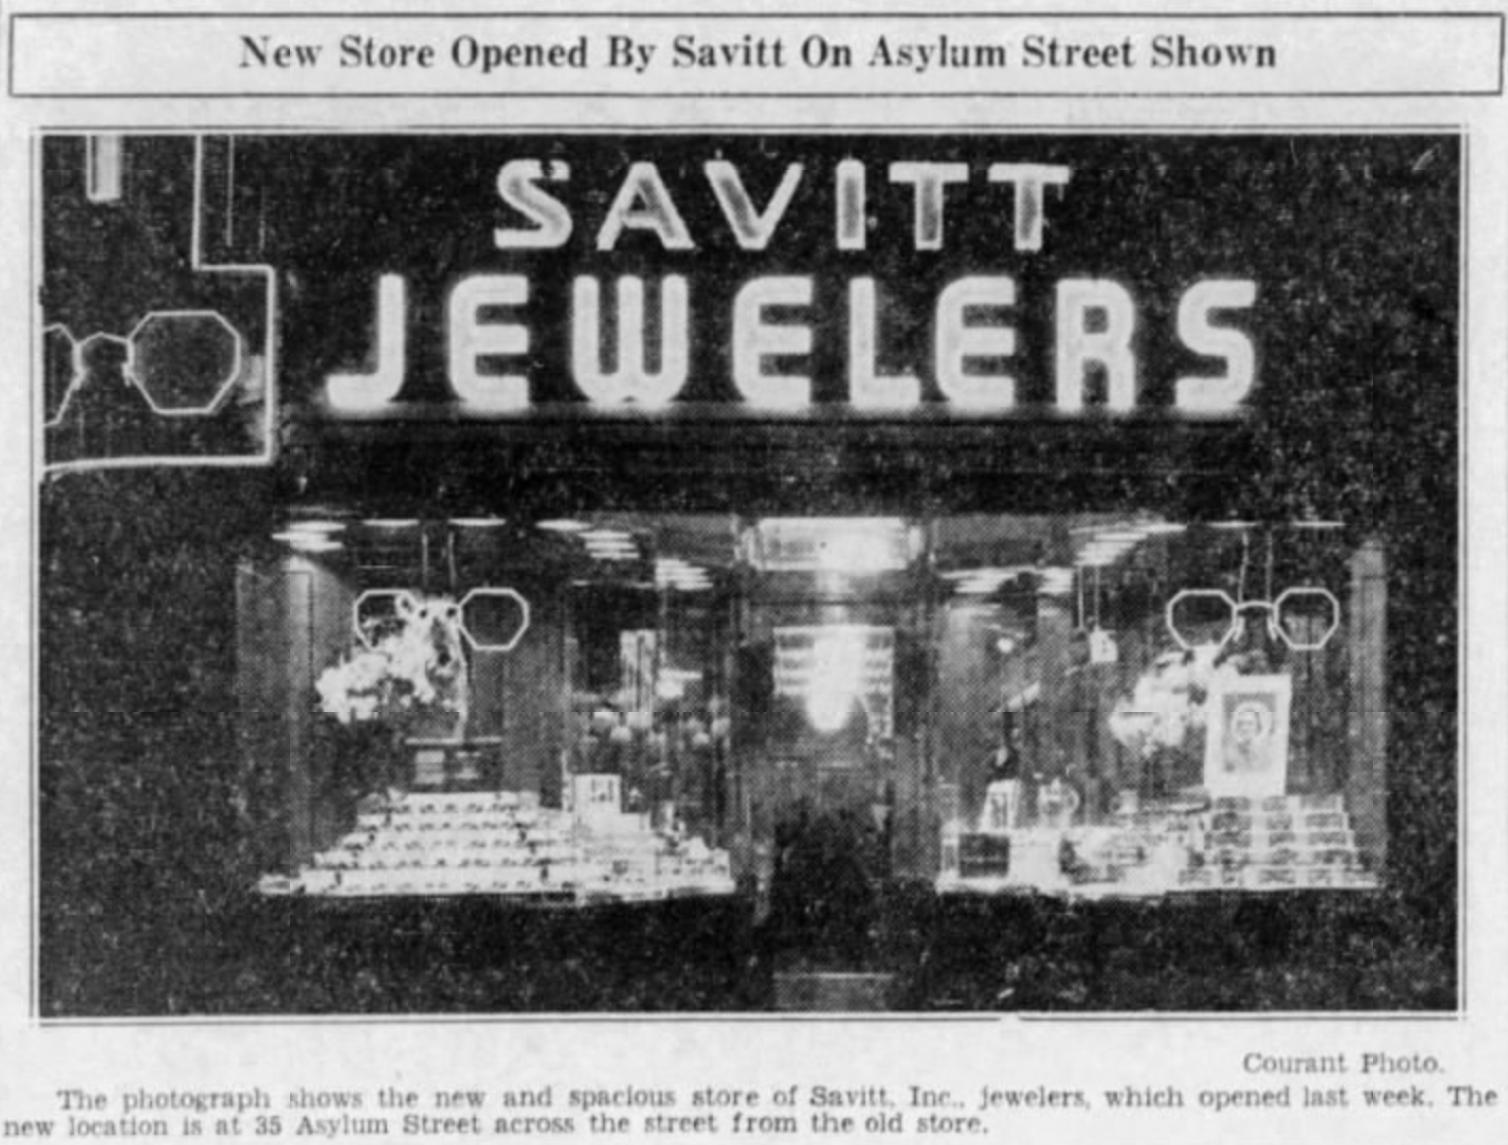 Savitt Jewelers exterior, 1936.